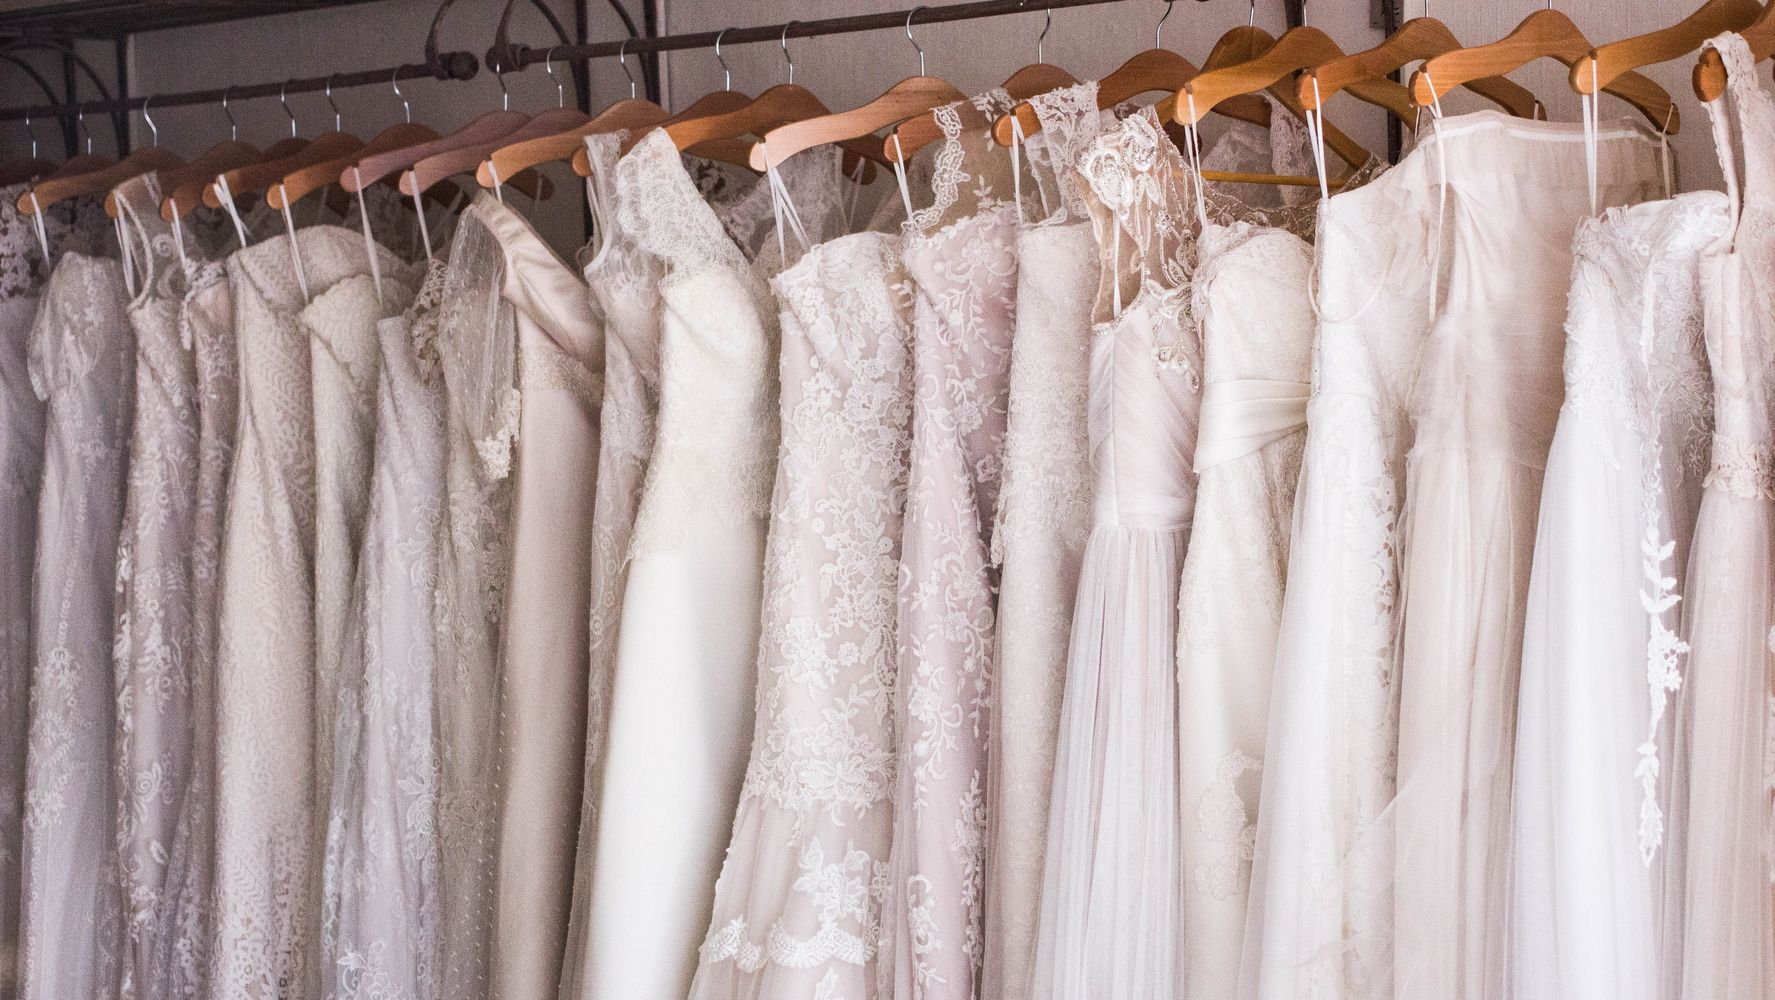 The Best Etsy Wedding Dress Shops To Find A Unique Dress Online